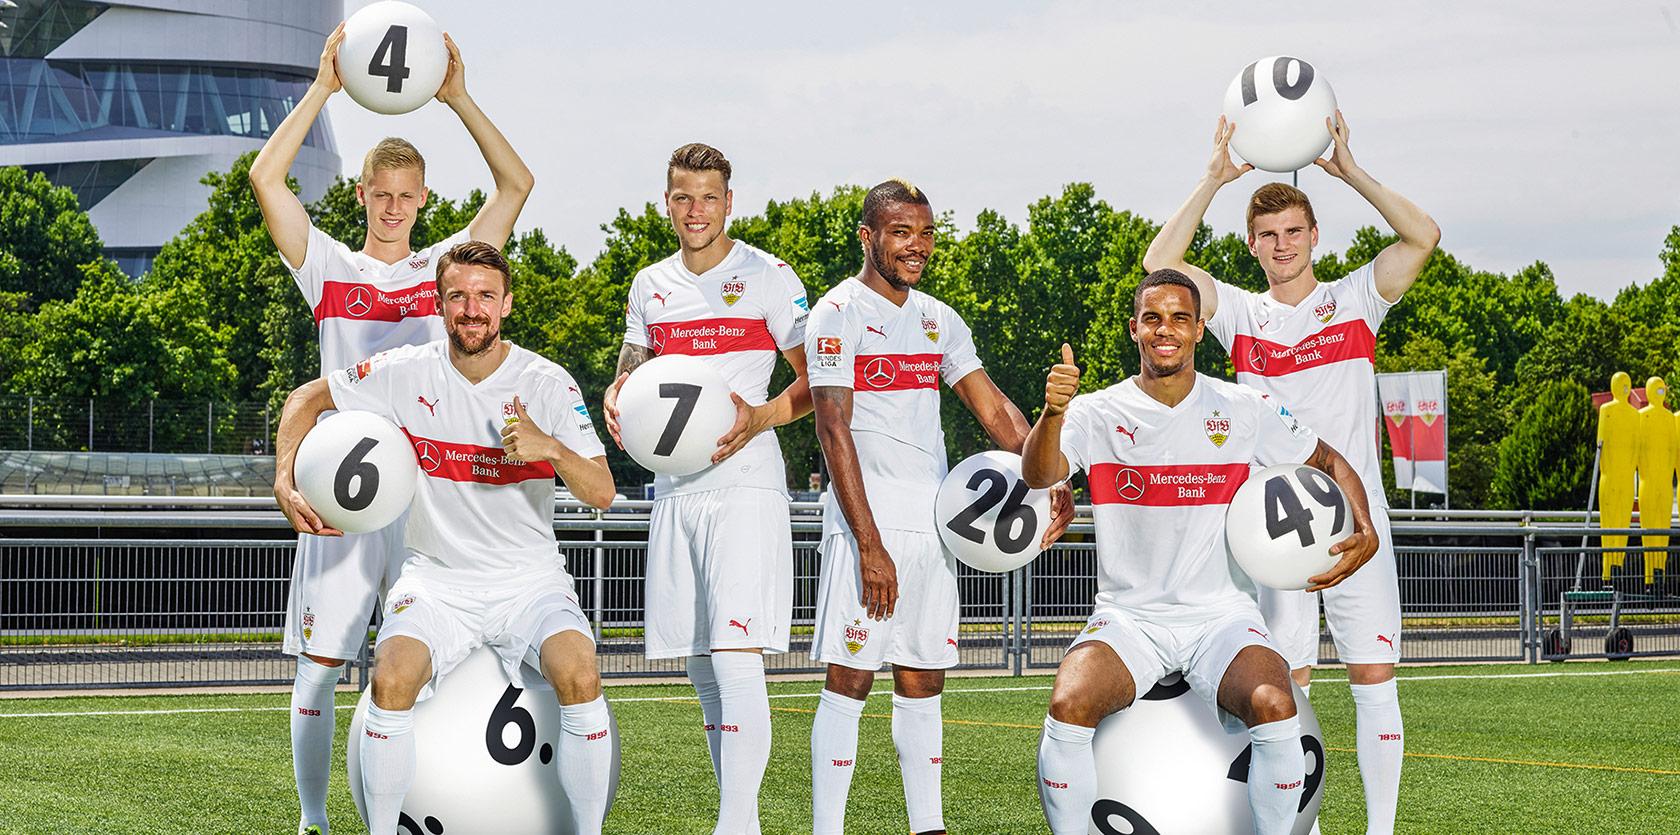 VfB Mannschaft mit Lotto Kugeln